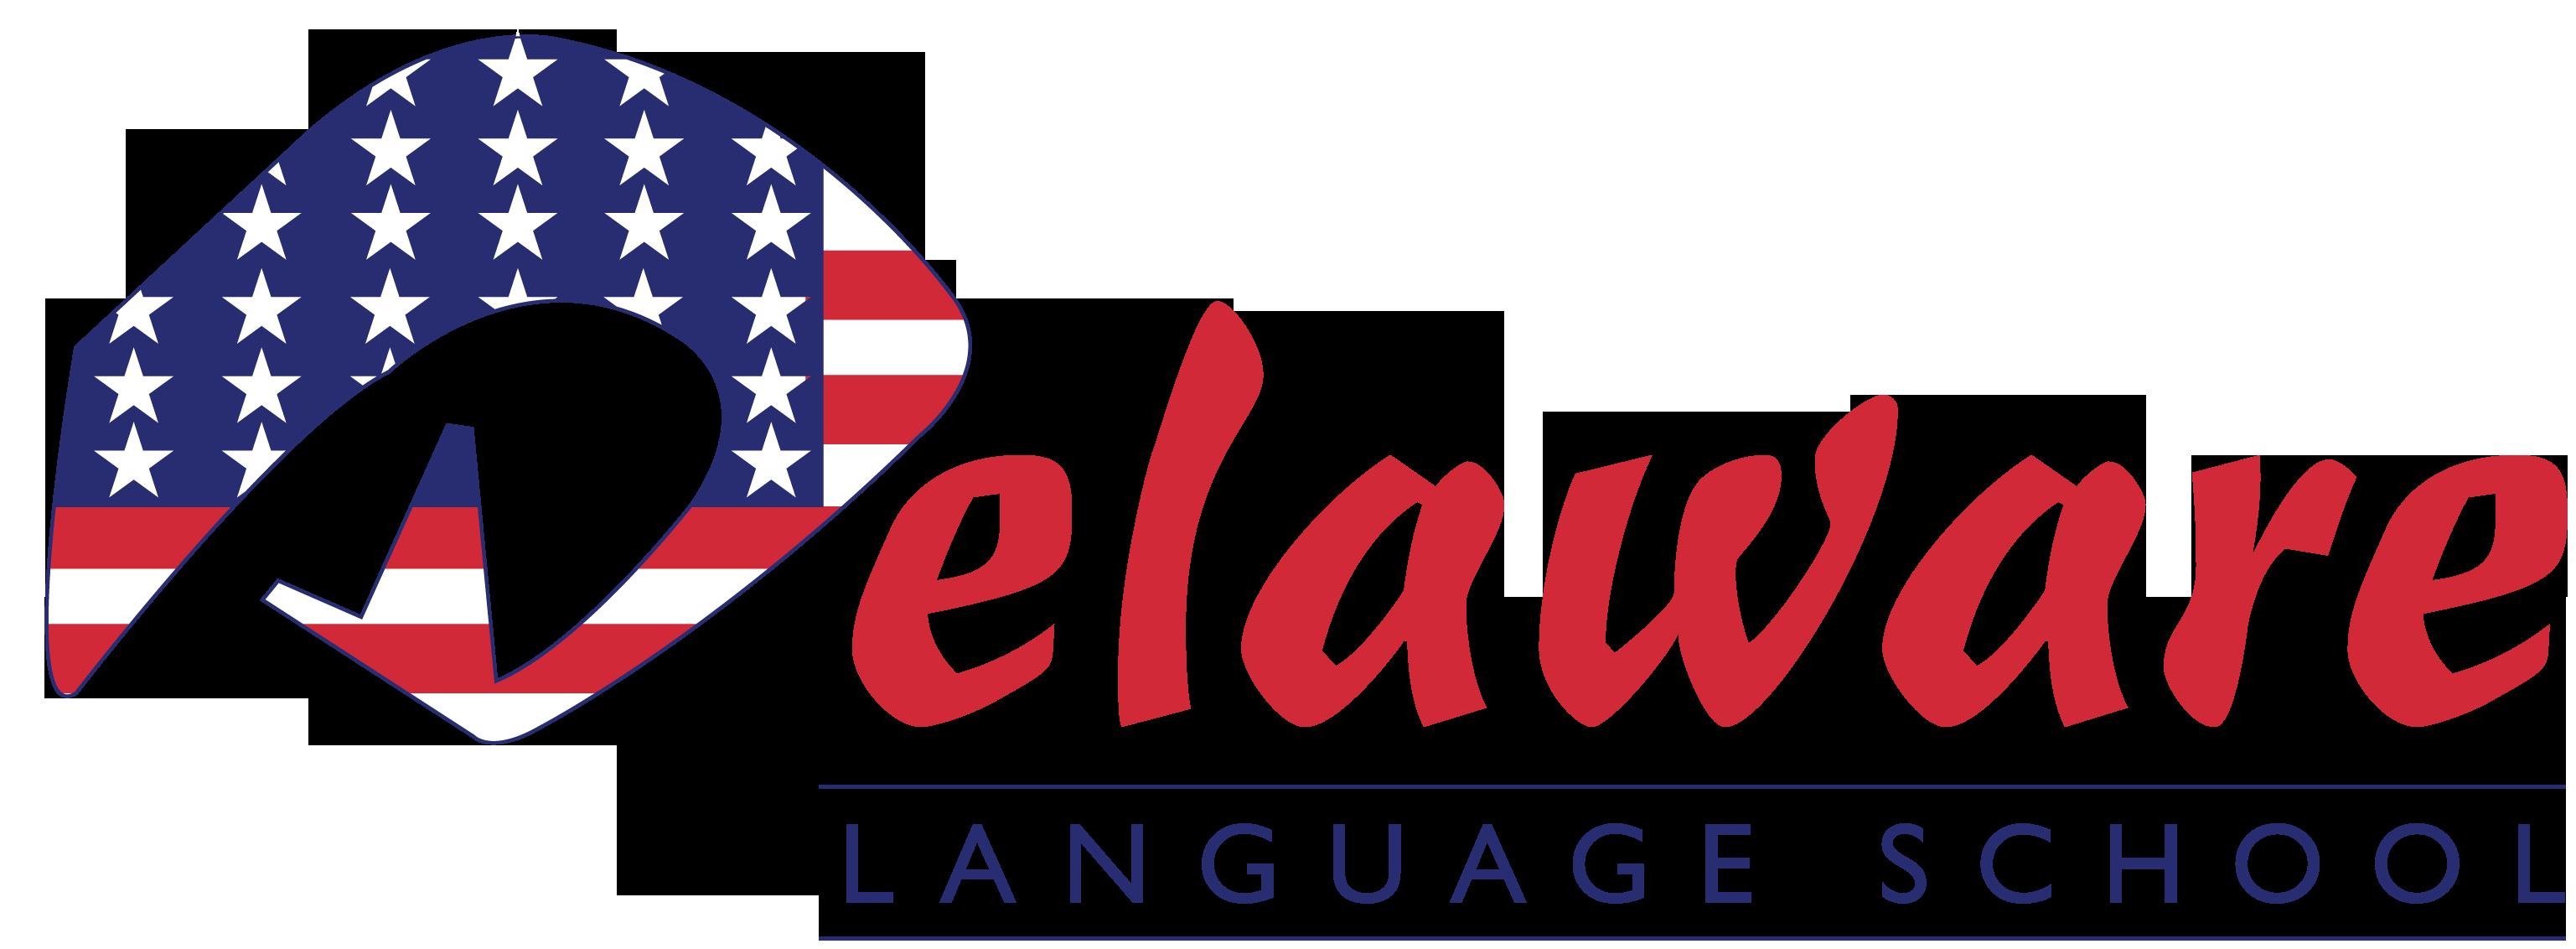 Academia de inglés DELAWARE